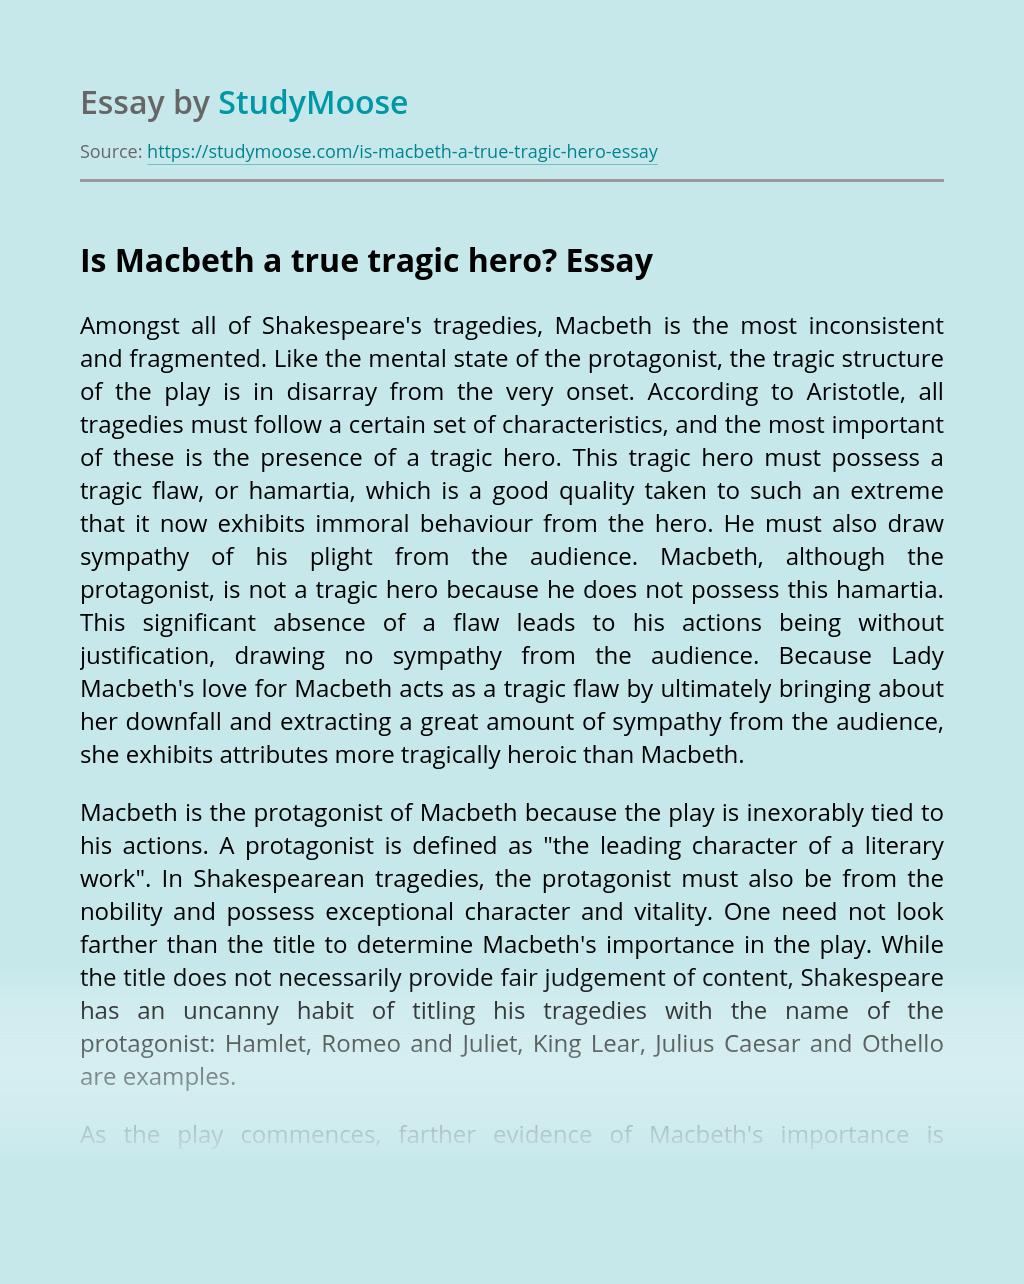 Is Macbeth a true tragic hero?